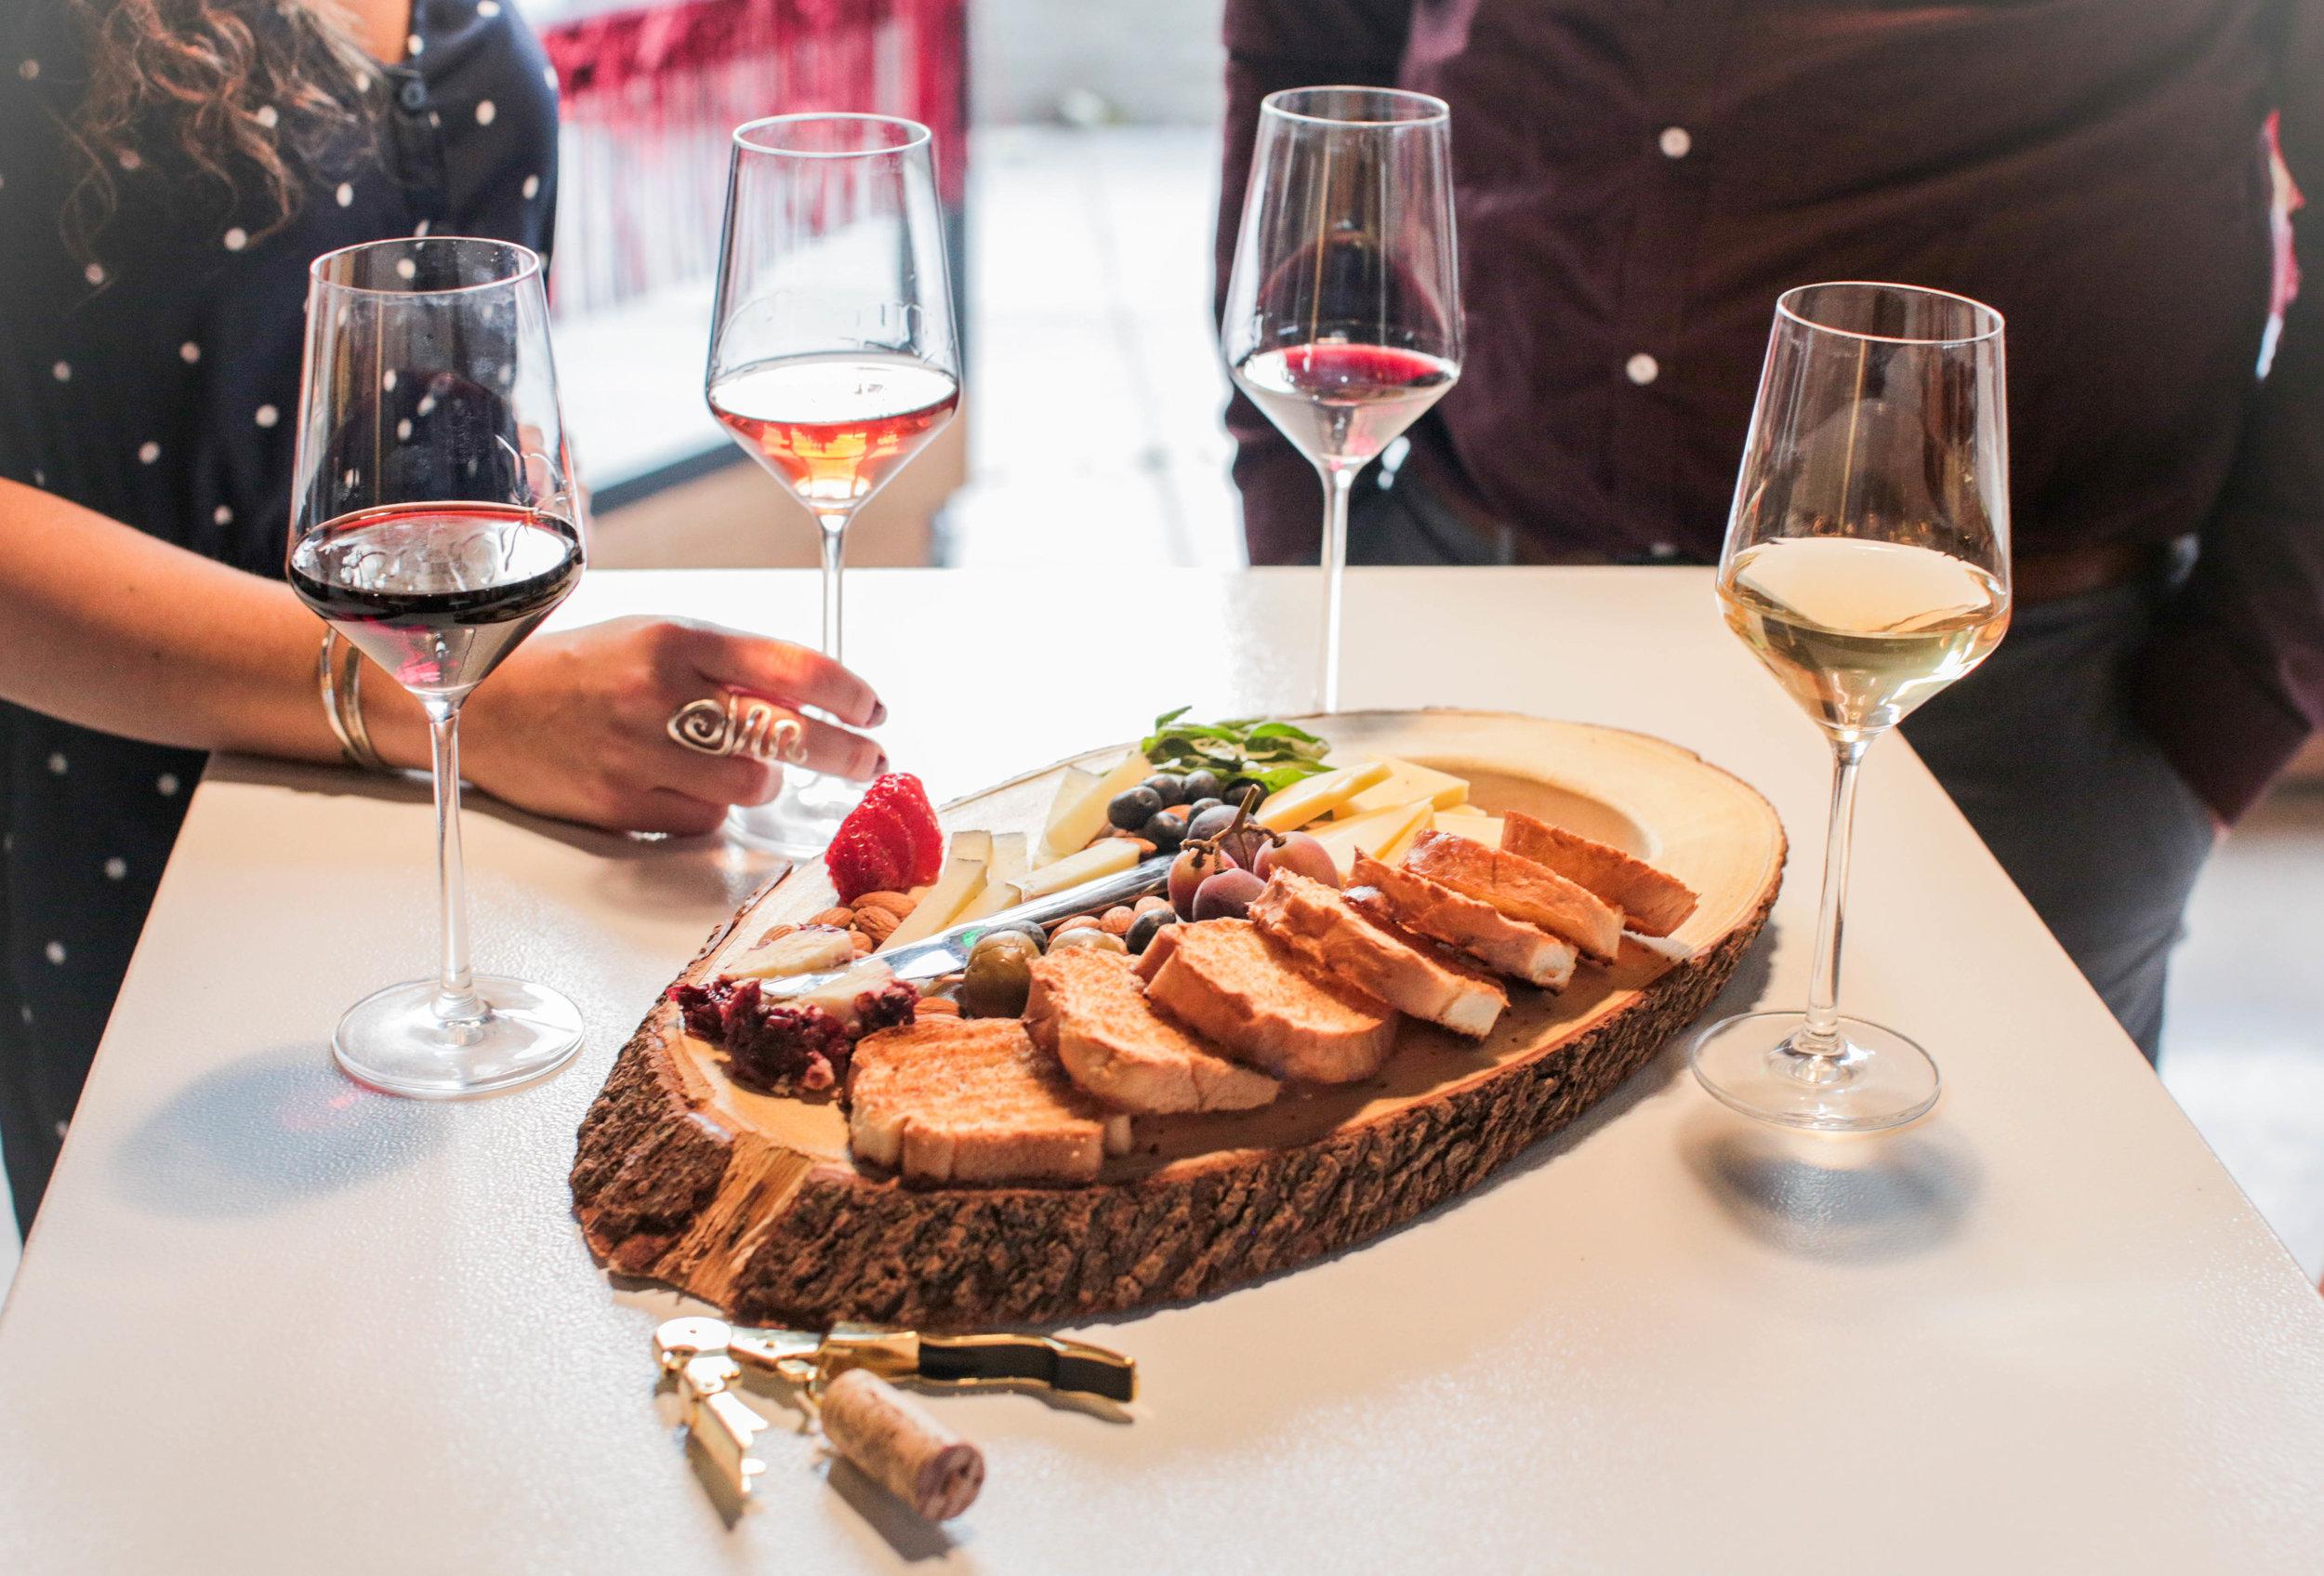 food-and-wine copy.jpg